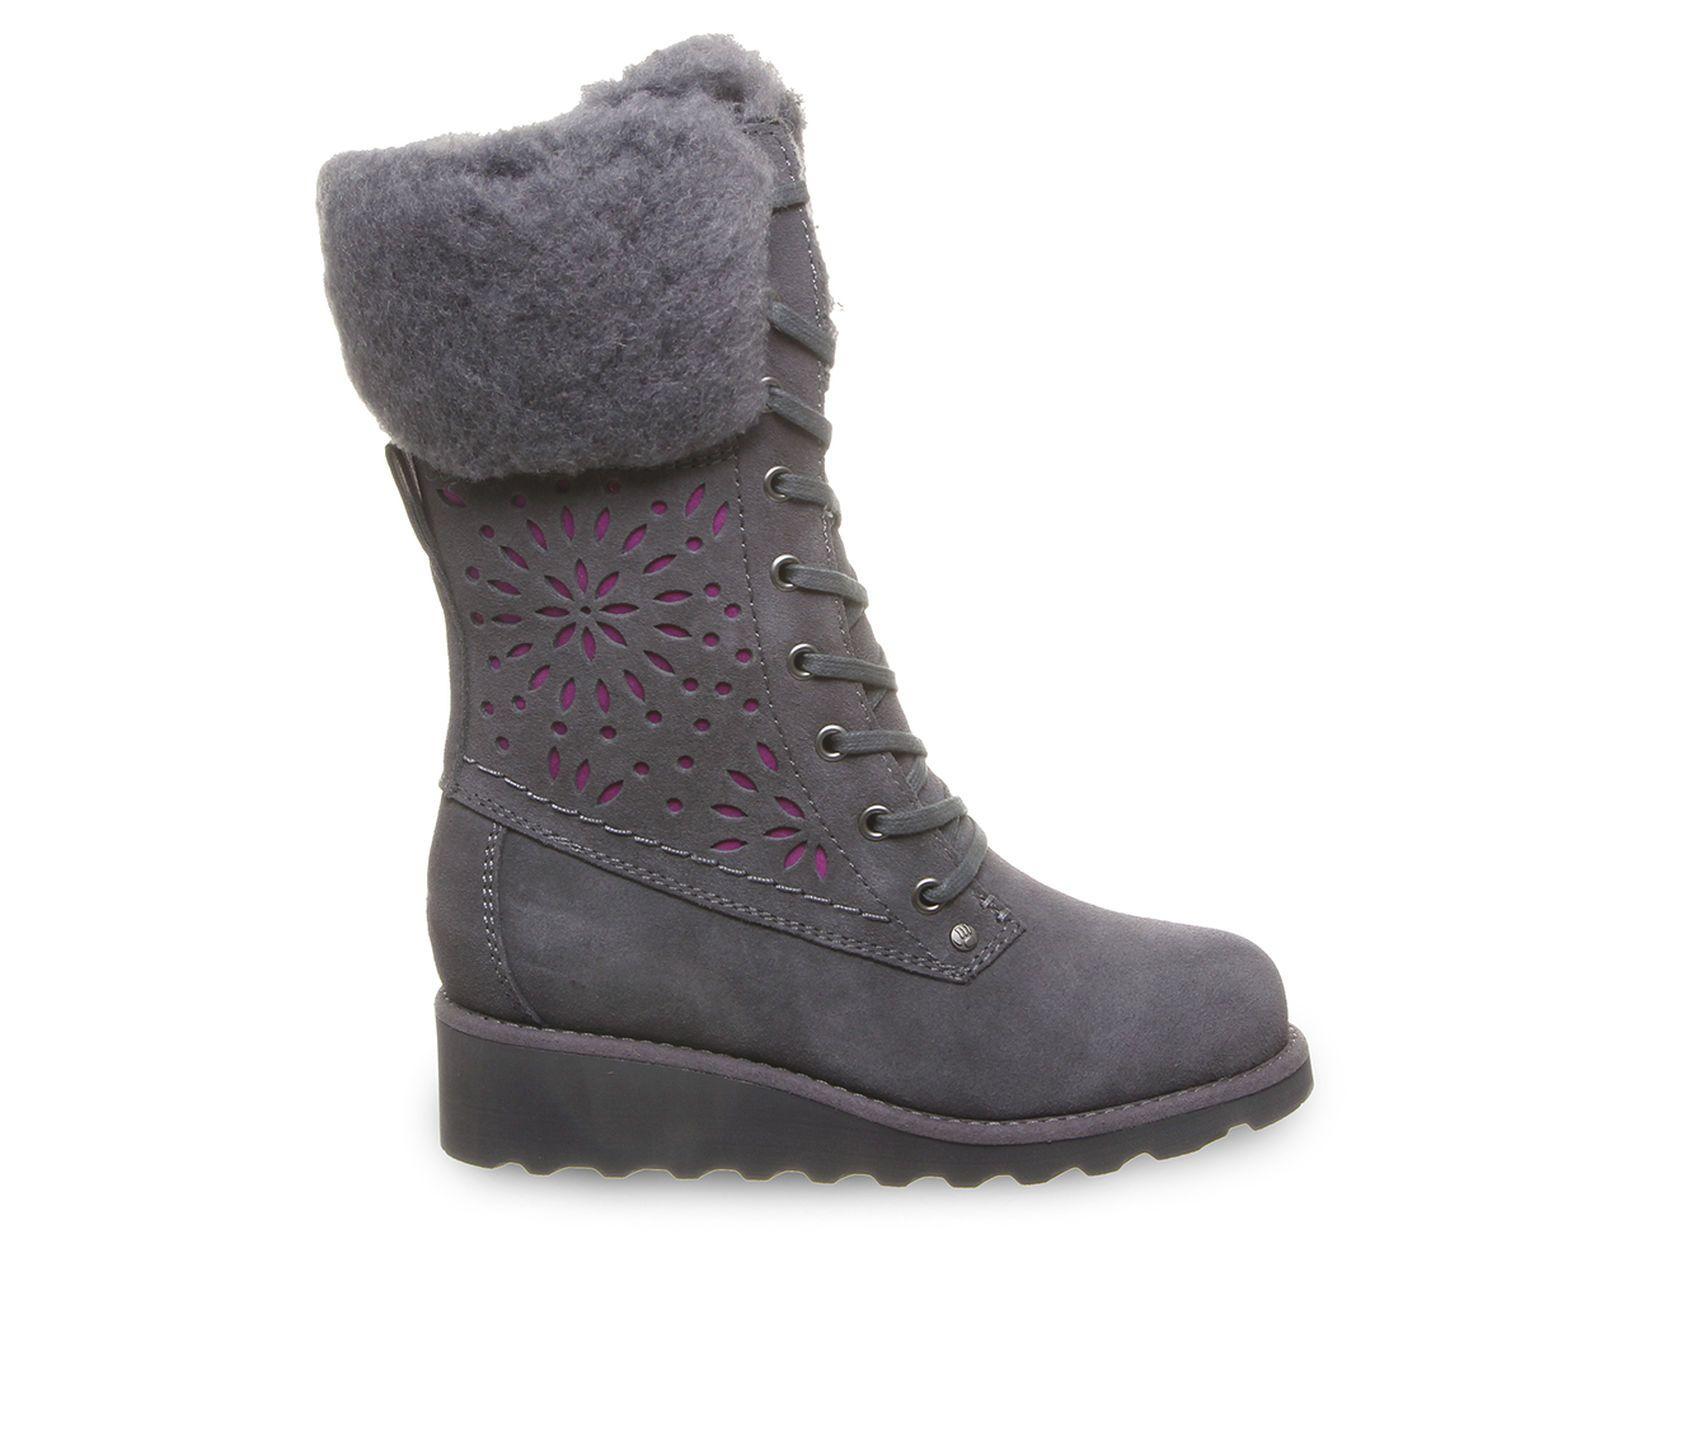 Girls' Bearpaw Kylie 13-5 Boots | Shoe